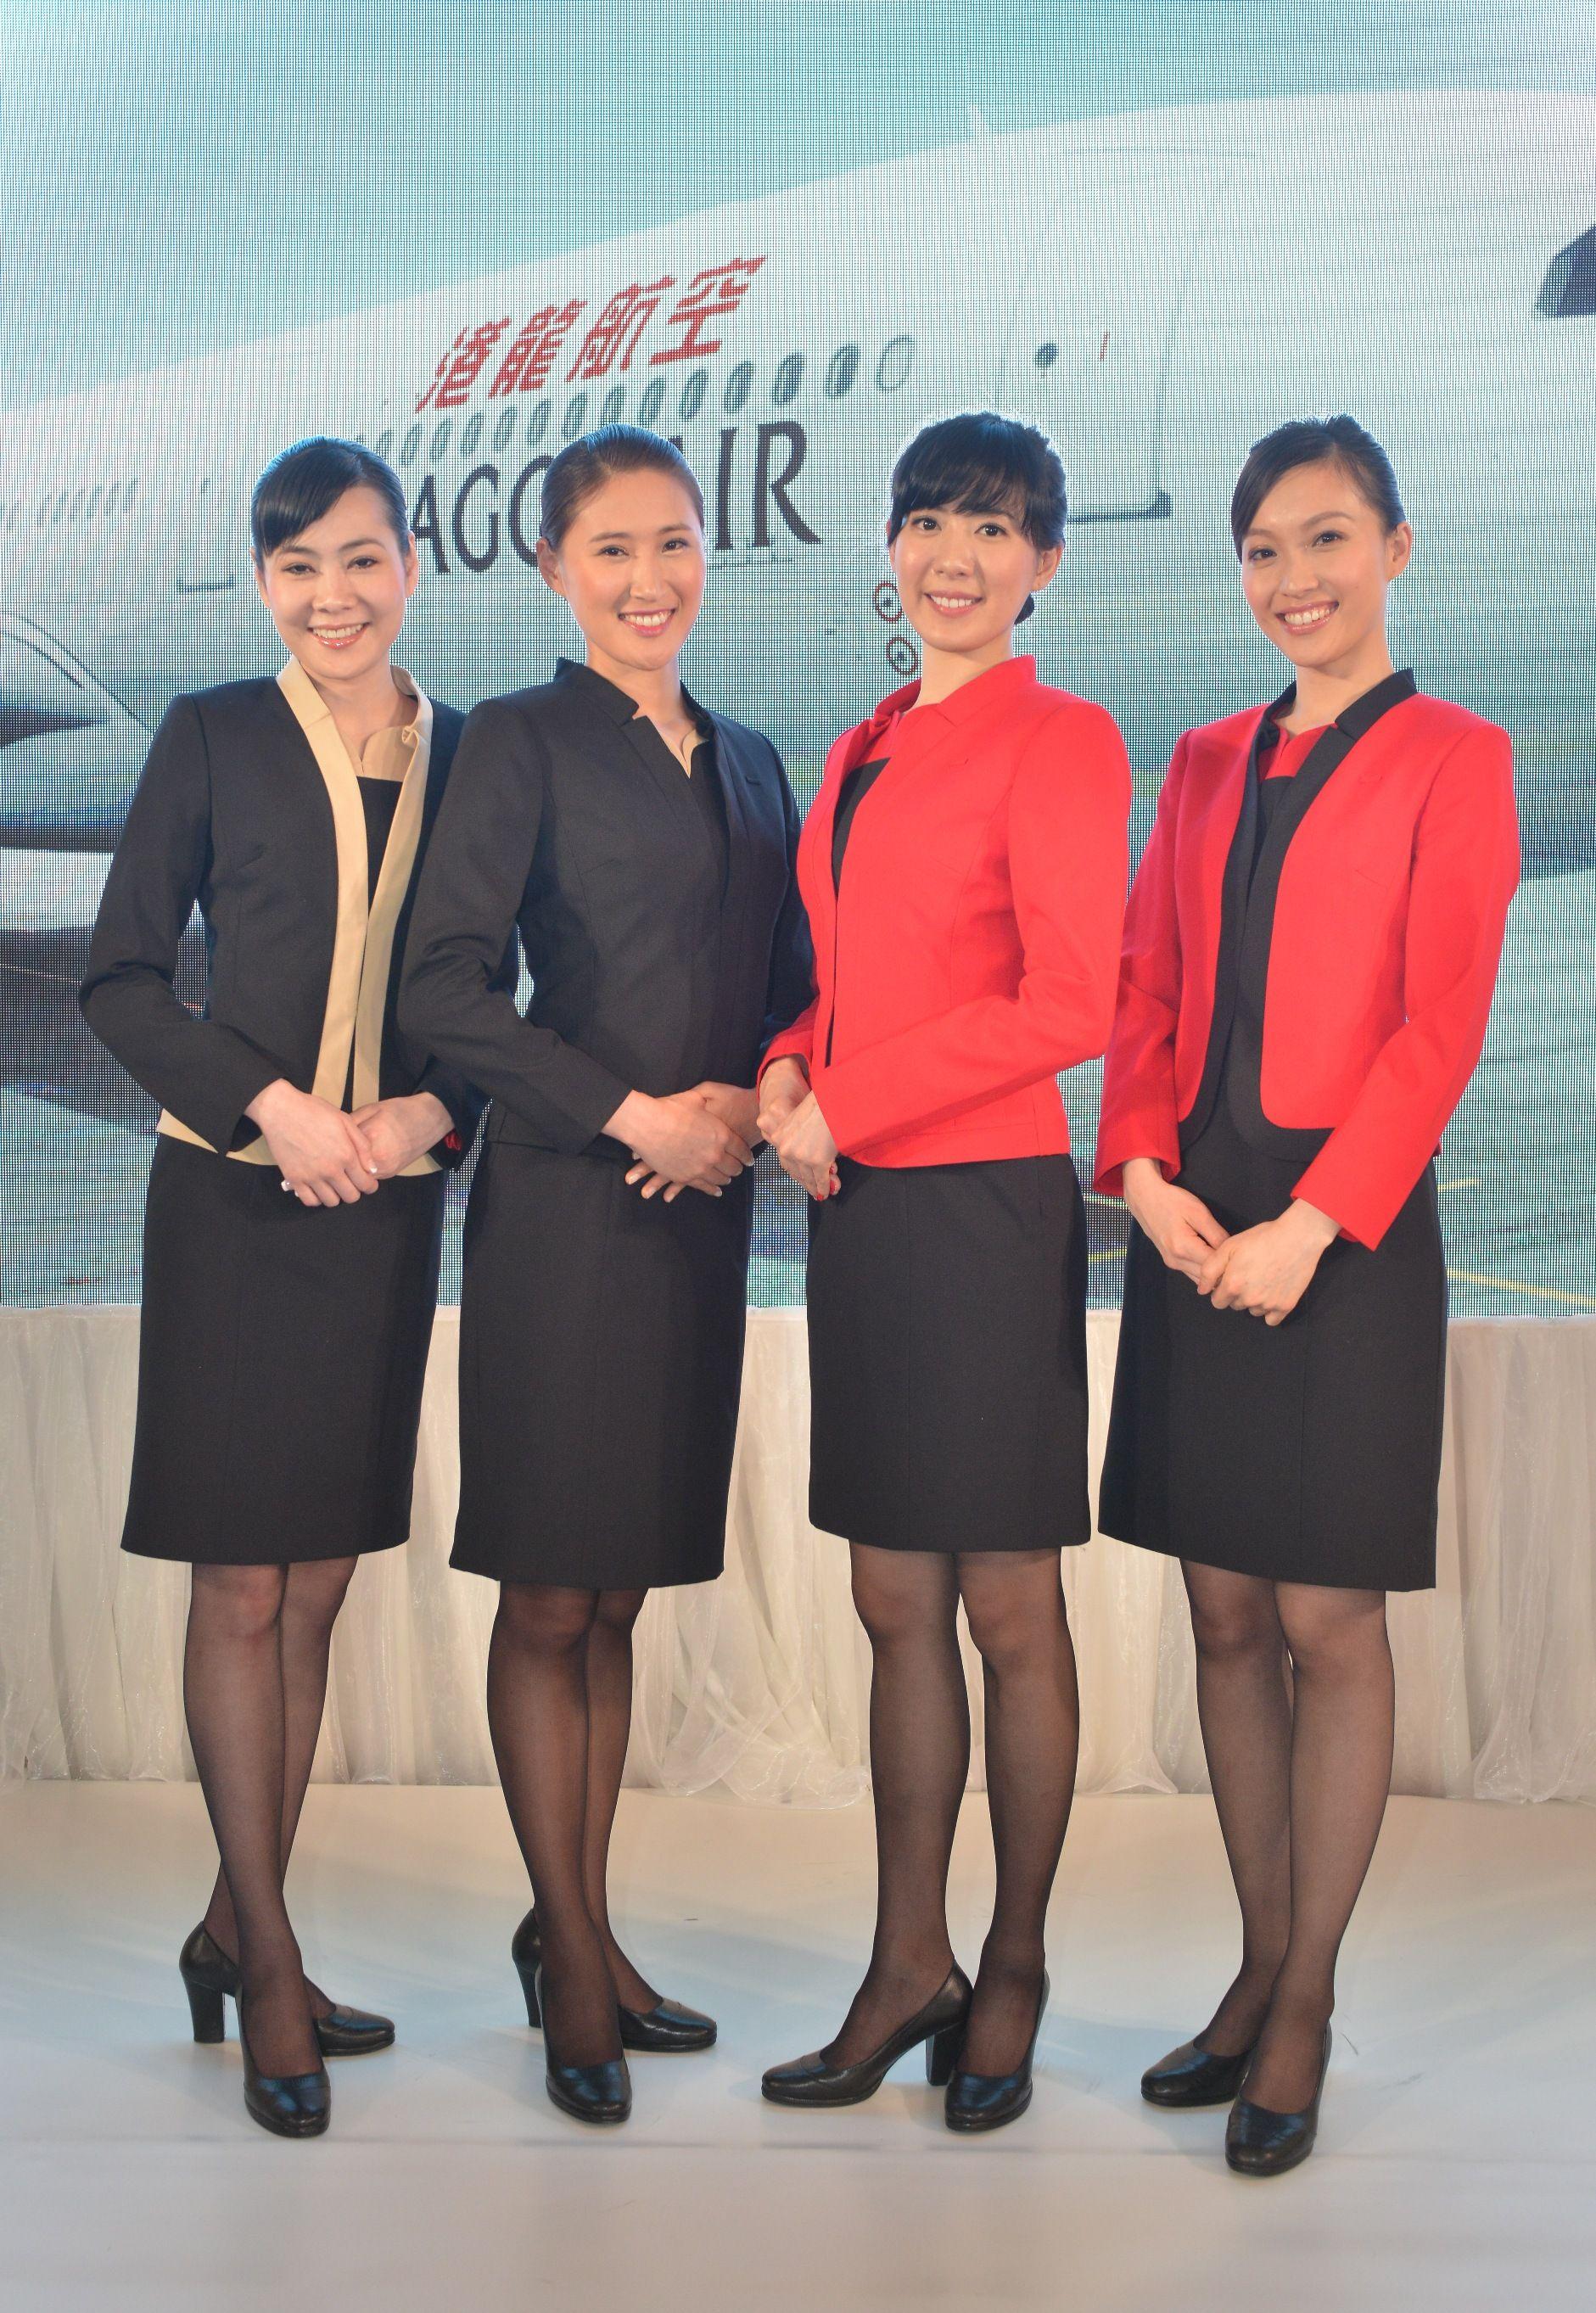 33debe40151363 Dragonair, Hong Kong 香港ドラゴン航空, 出席, 客室乗務員, 行李, 美脚